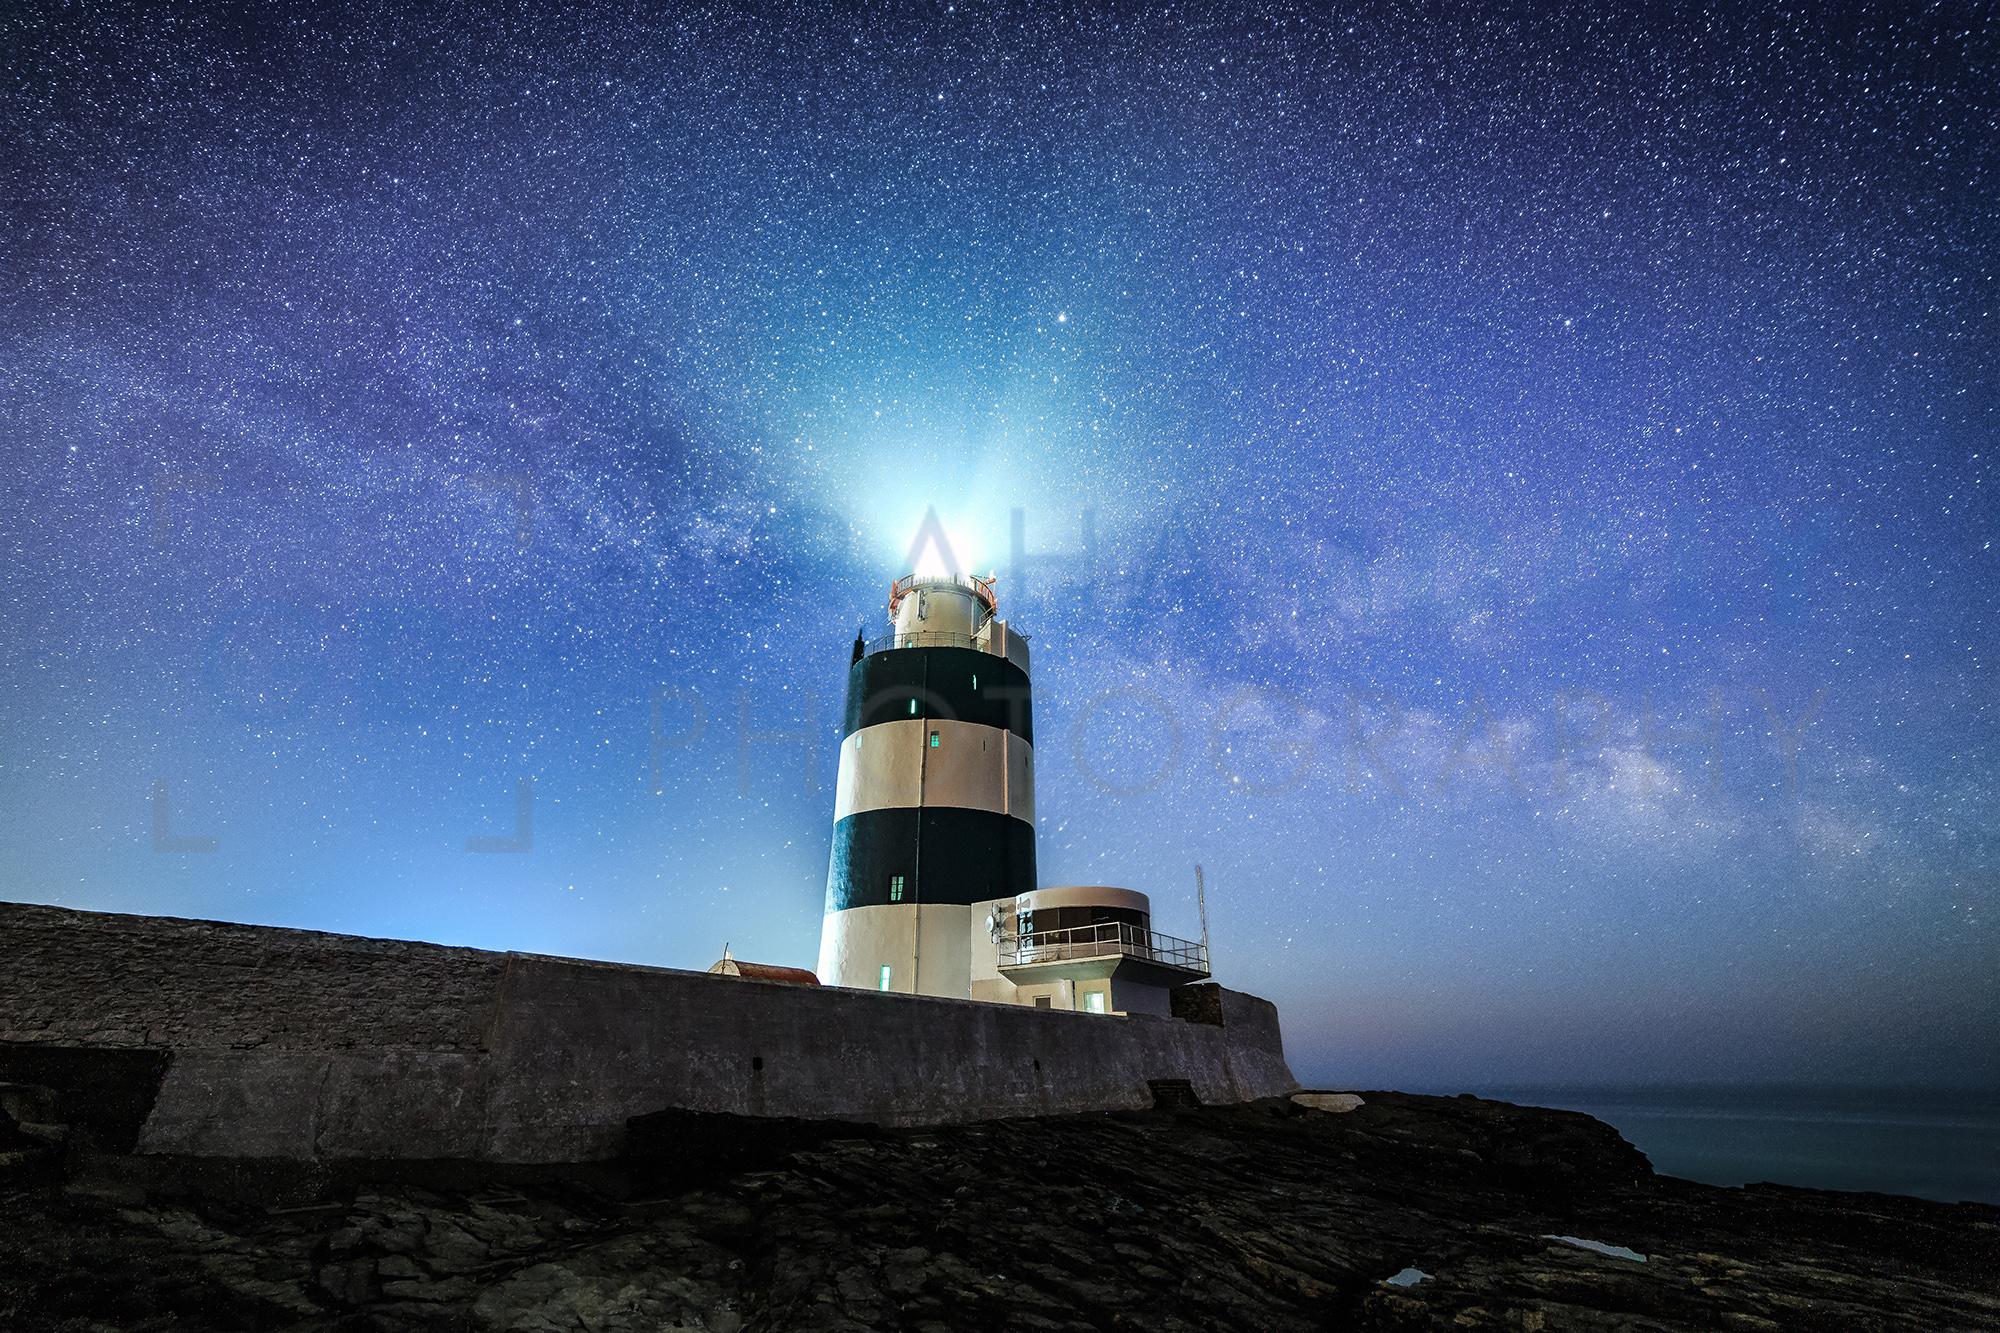 Hook Lighthouse under The Milky Way